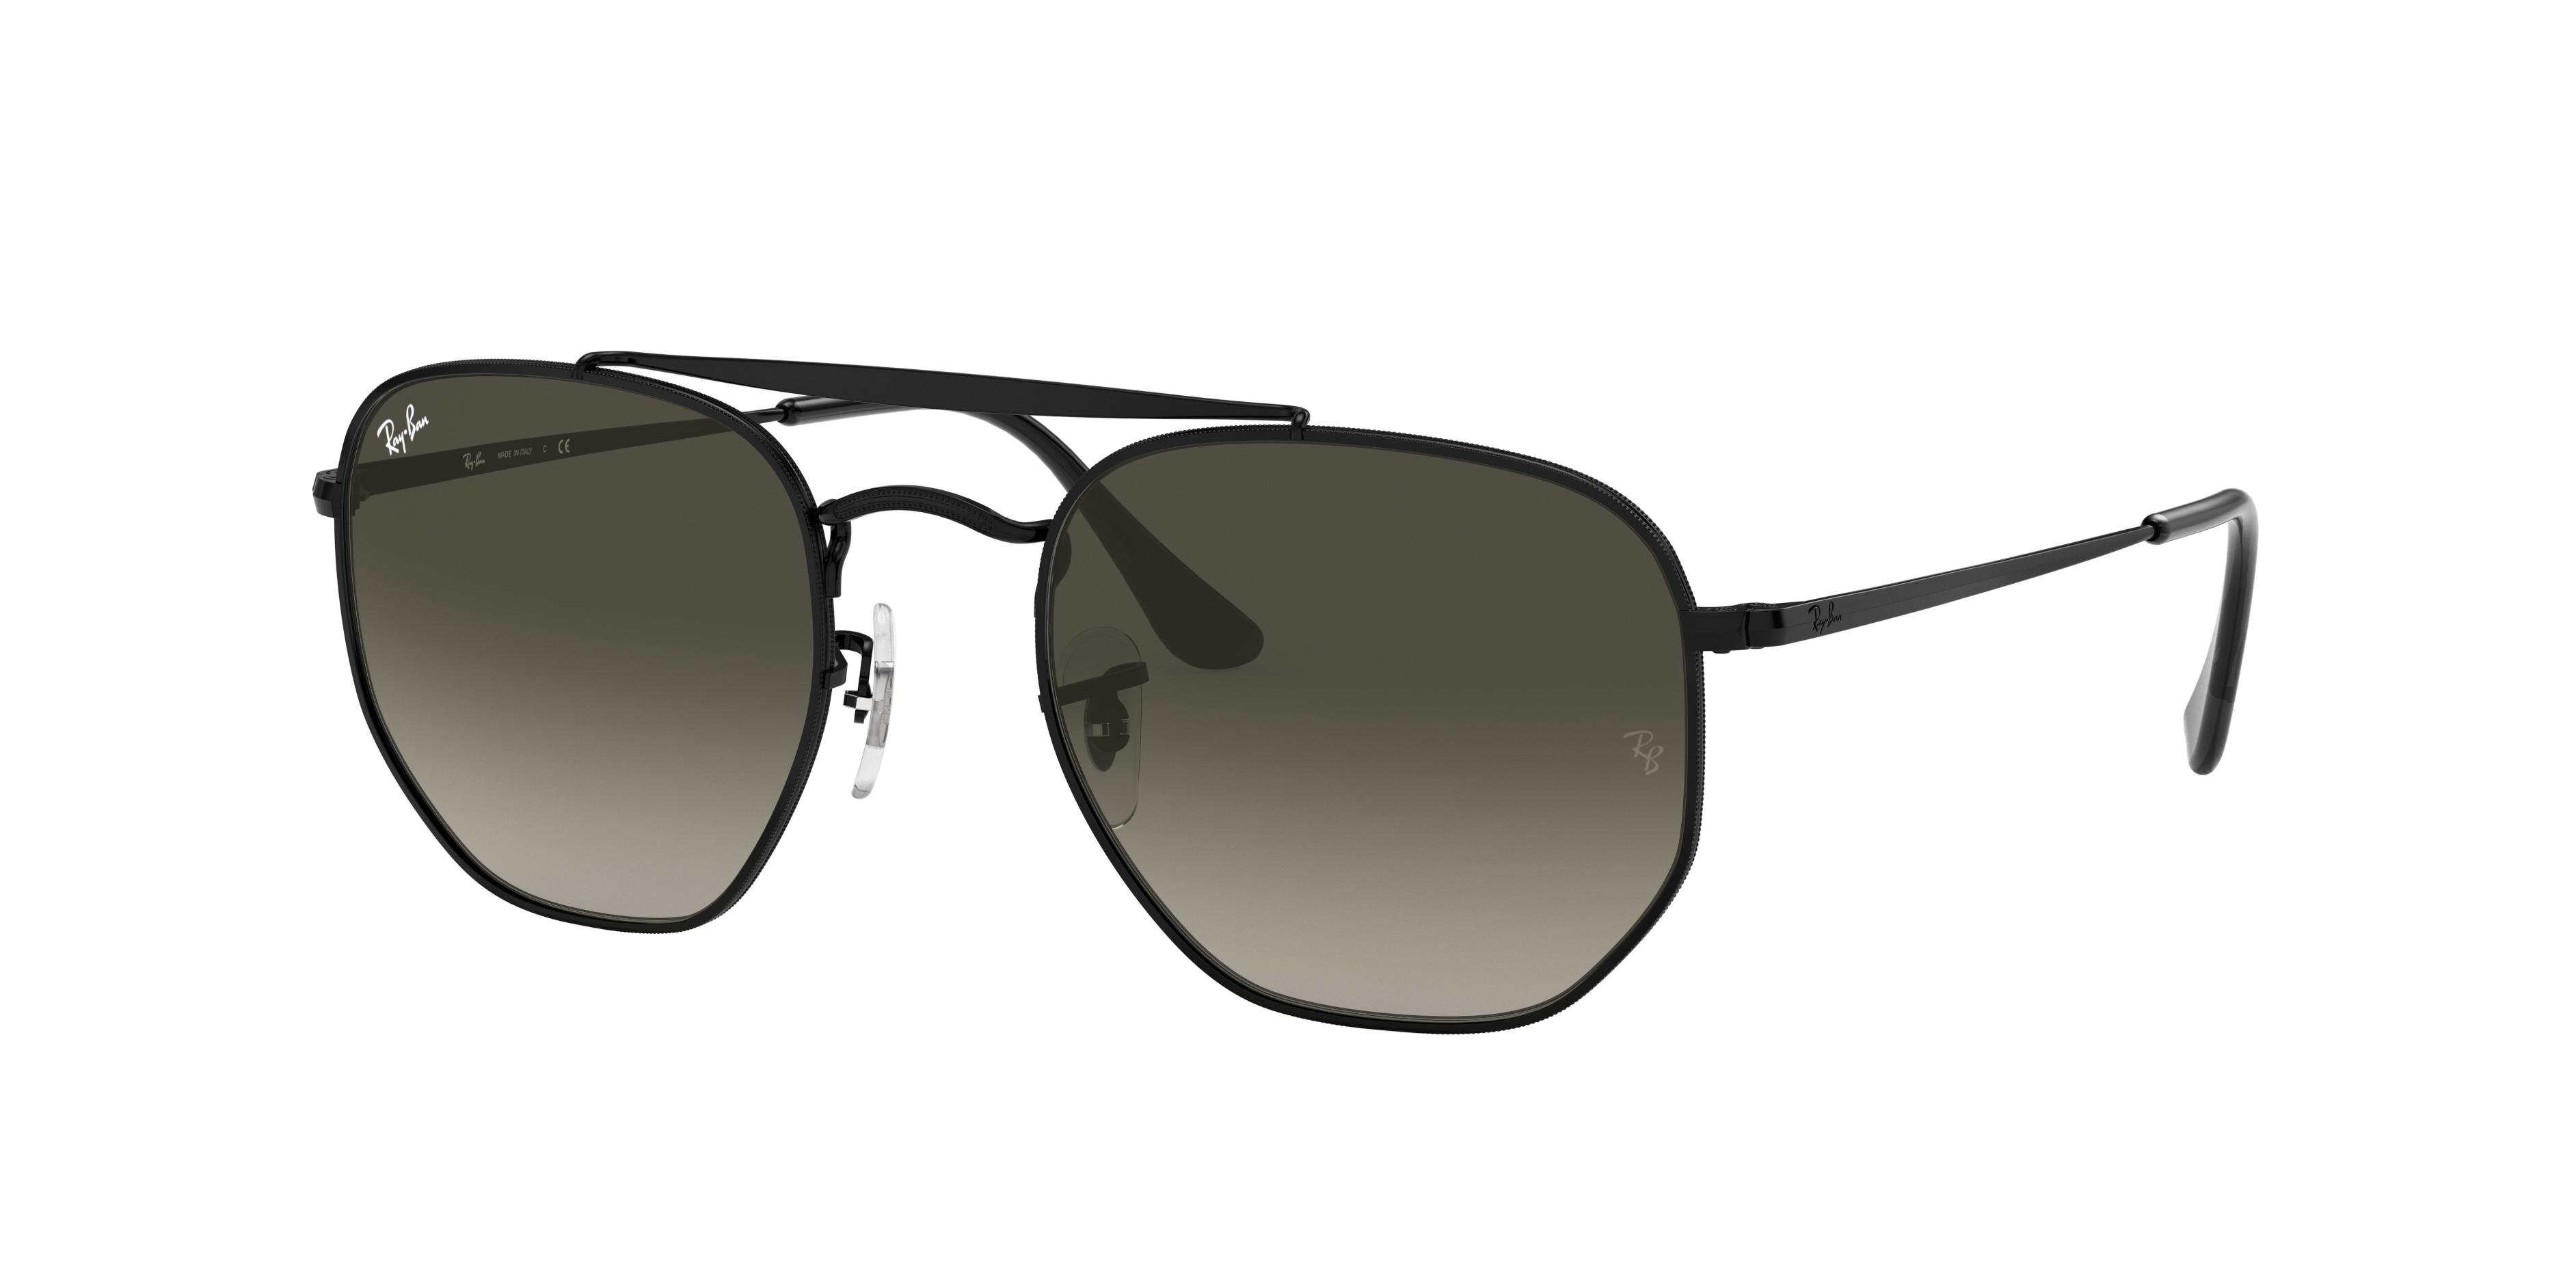 Ray-Ban Marshal Black, Gray Lenses - RB3648